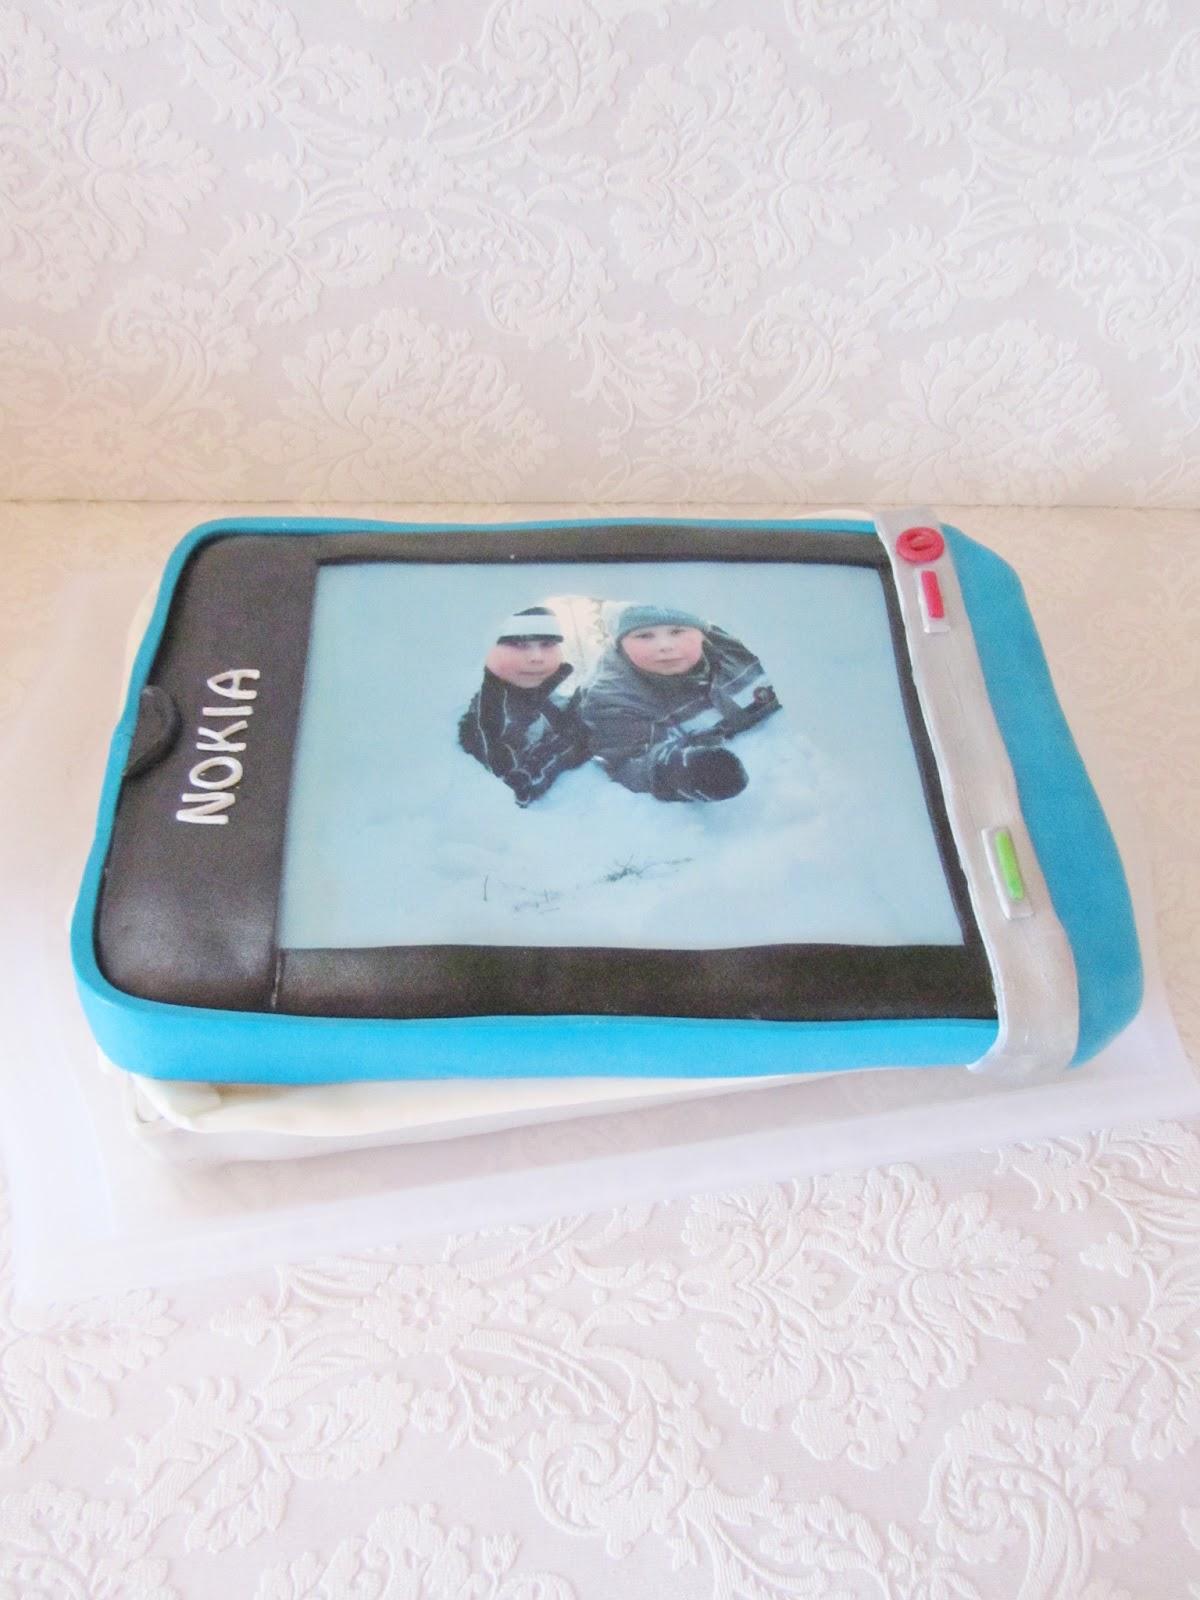 kakun täyte Nokia